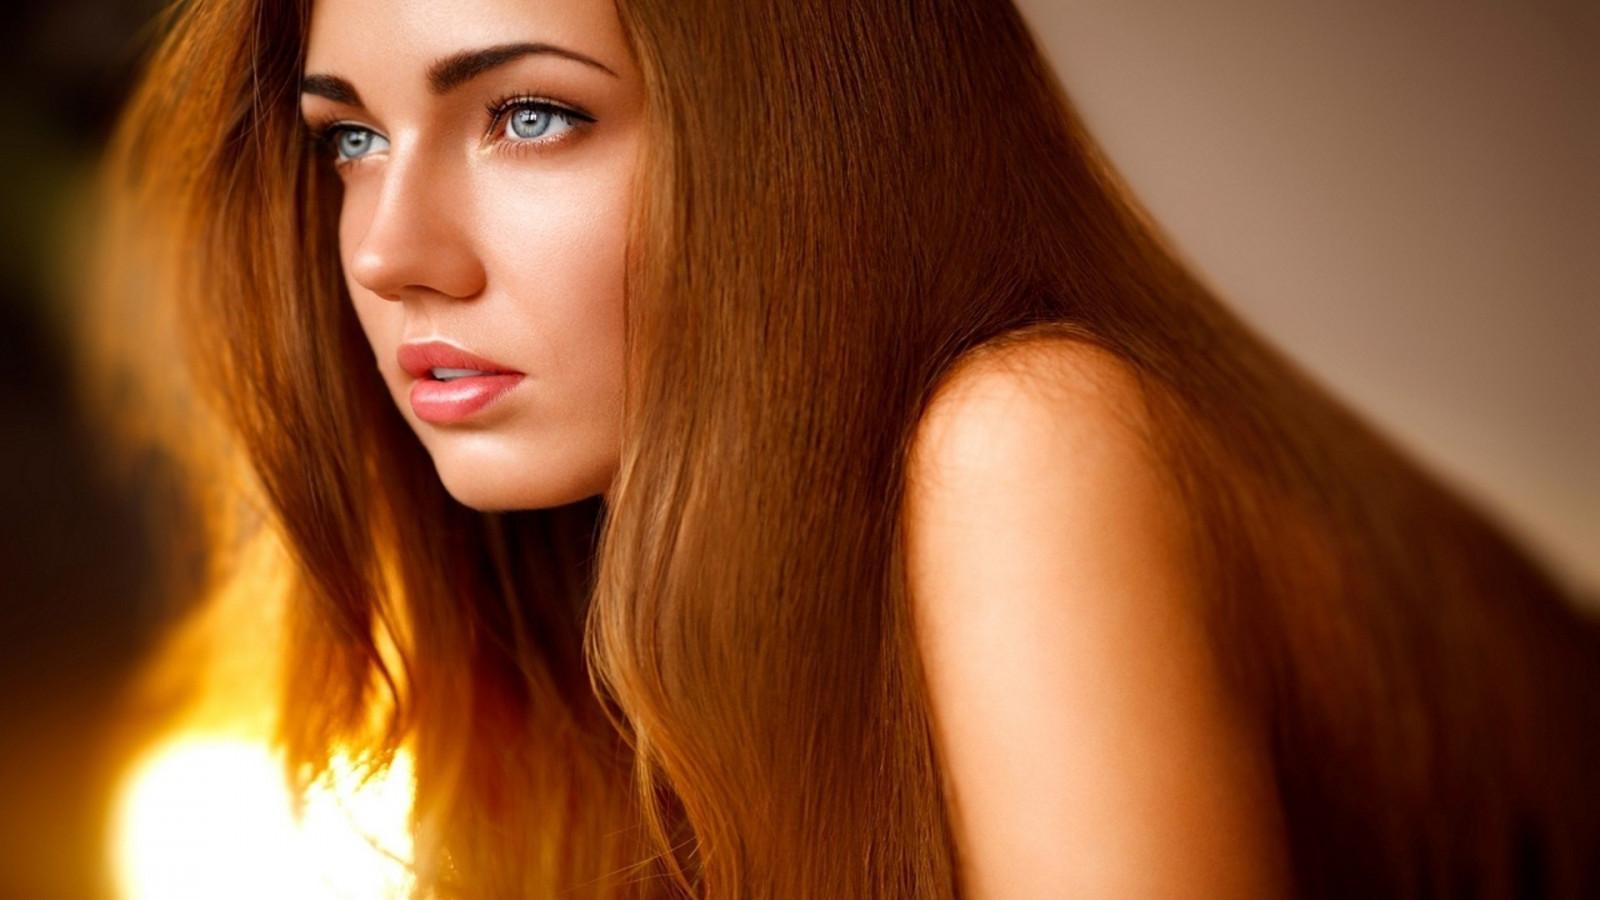 Wallpaper Face Women Model Long Hair Blue Eyes: Wallpaper : Face, Lights, Women, Redhead, Model, Looking